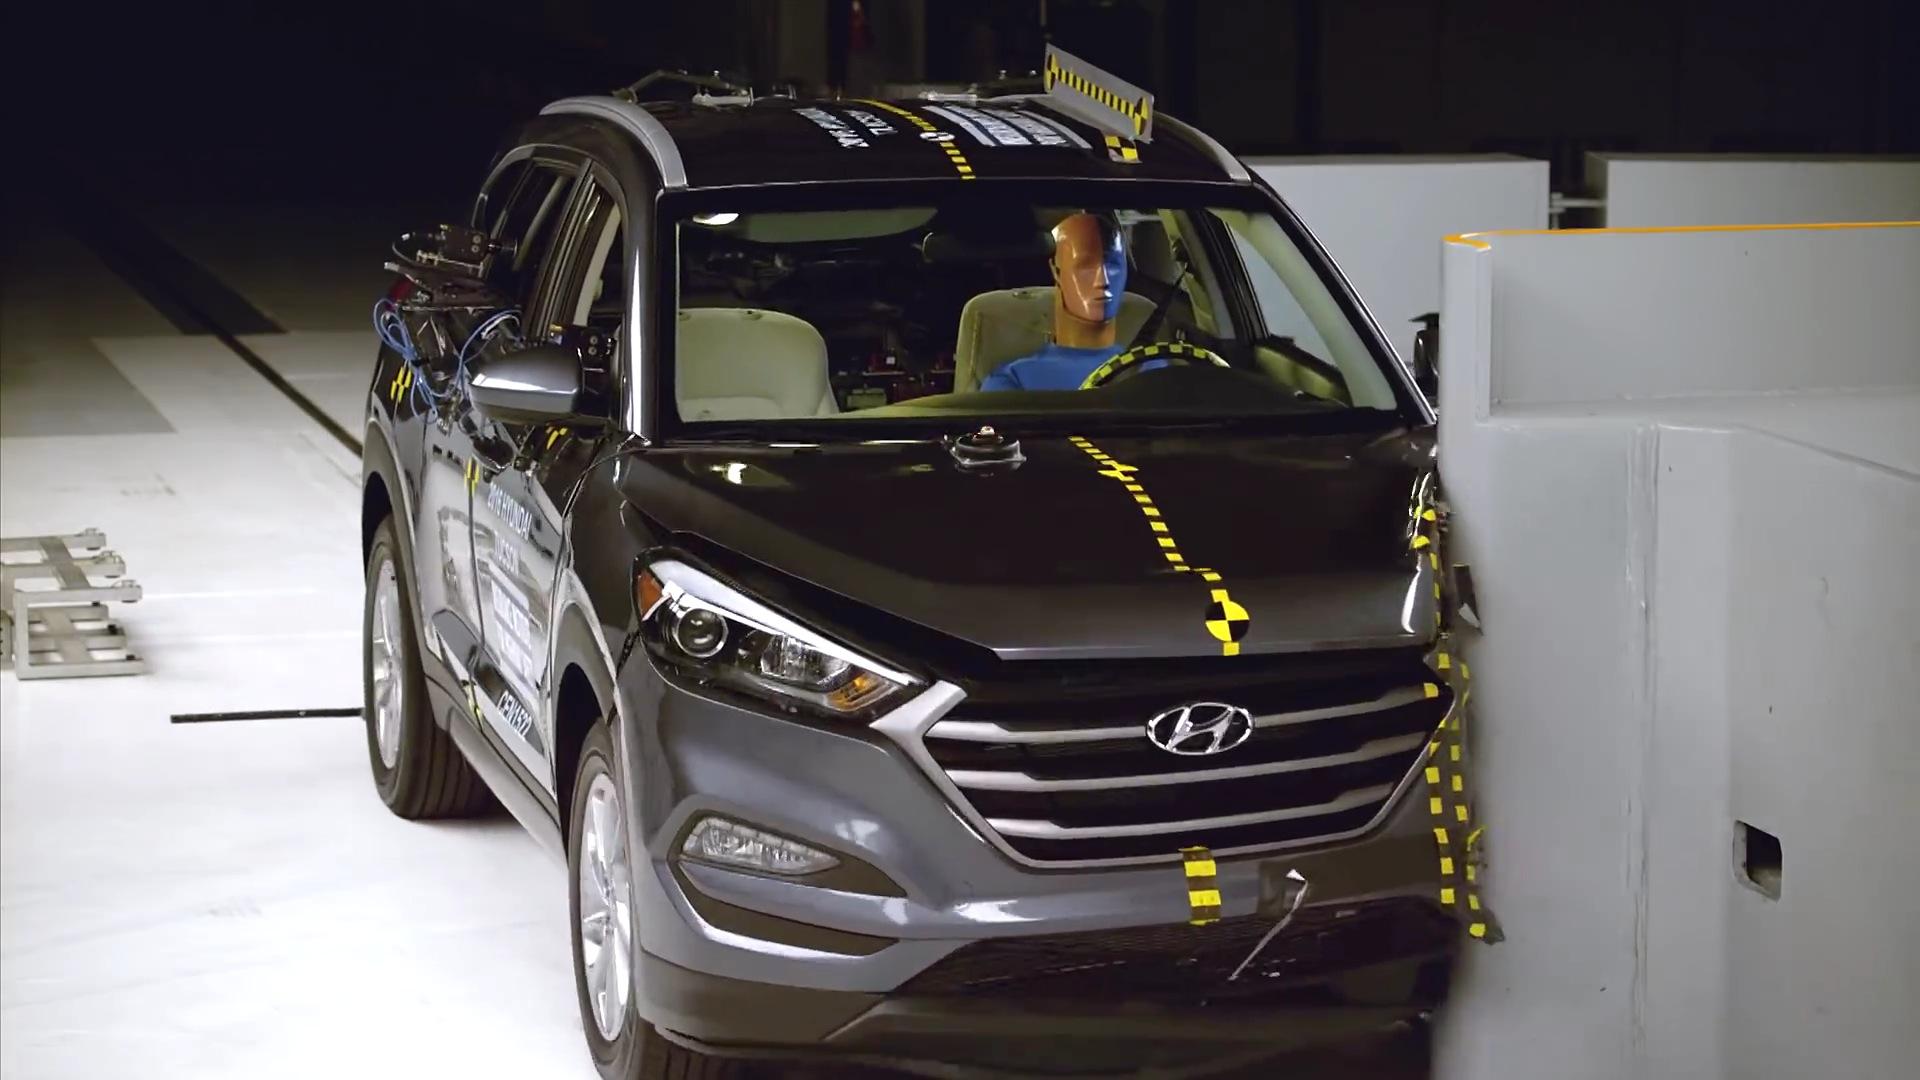 Iihs Safety Ratings >> 2016 Hyundai Tucson Aces Iihs Crash Tests Gets Maximum Safety